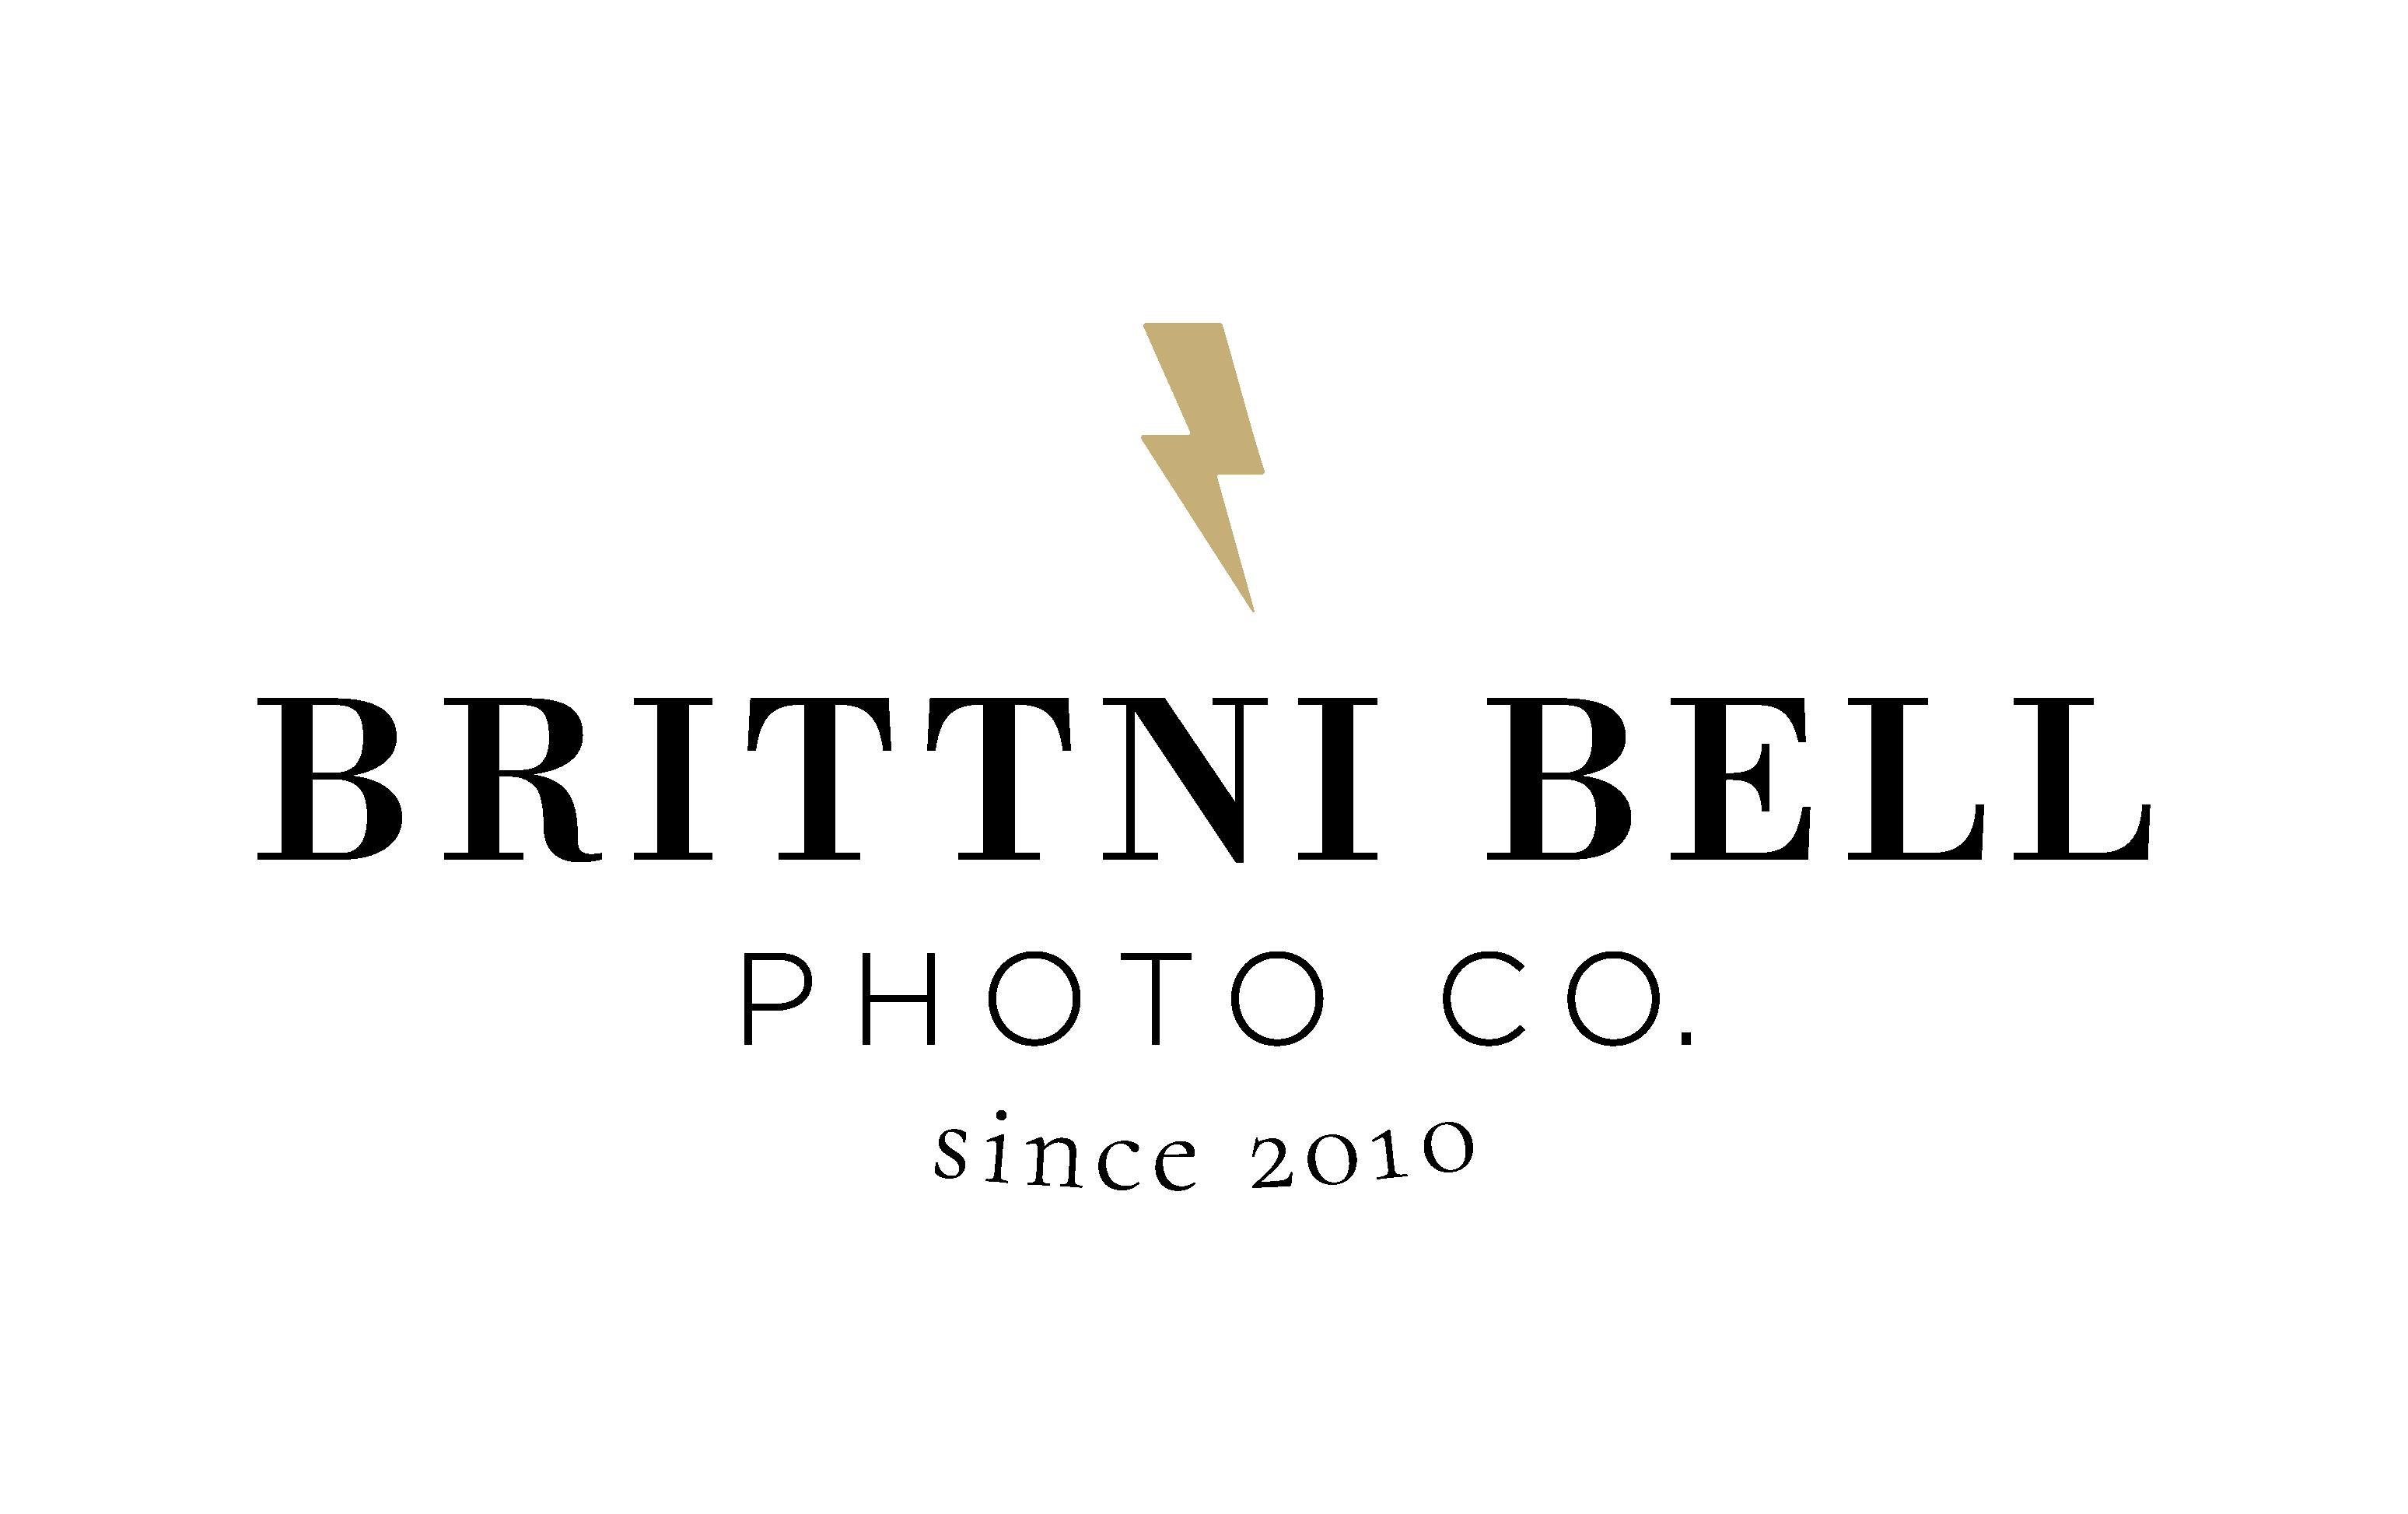 Brittni Bell Photo